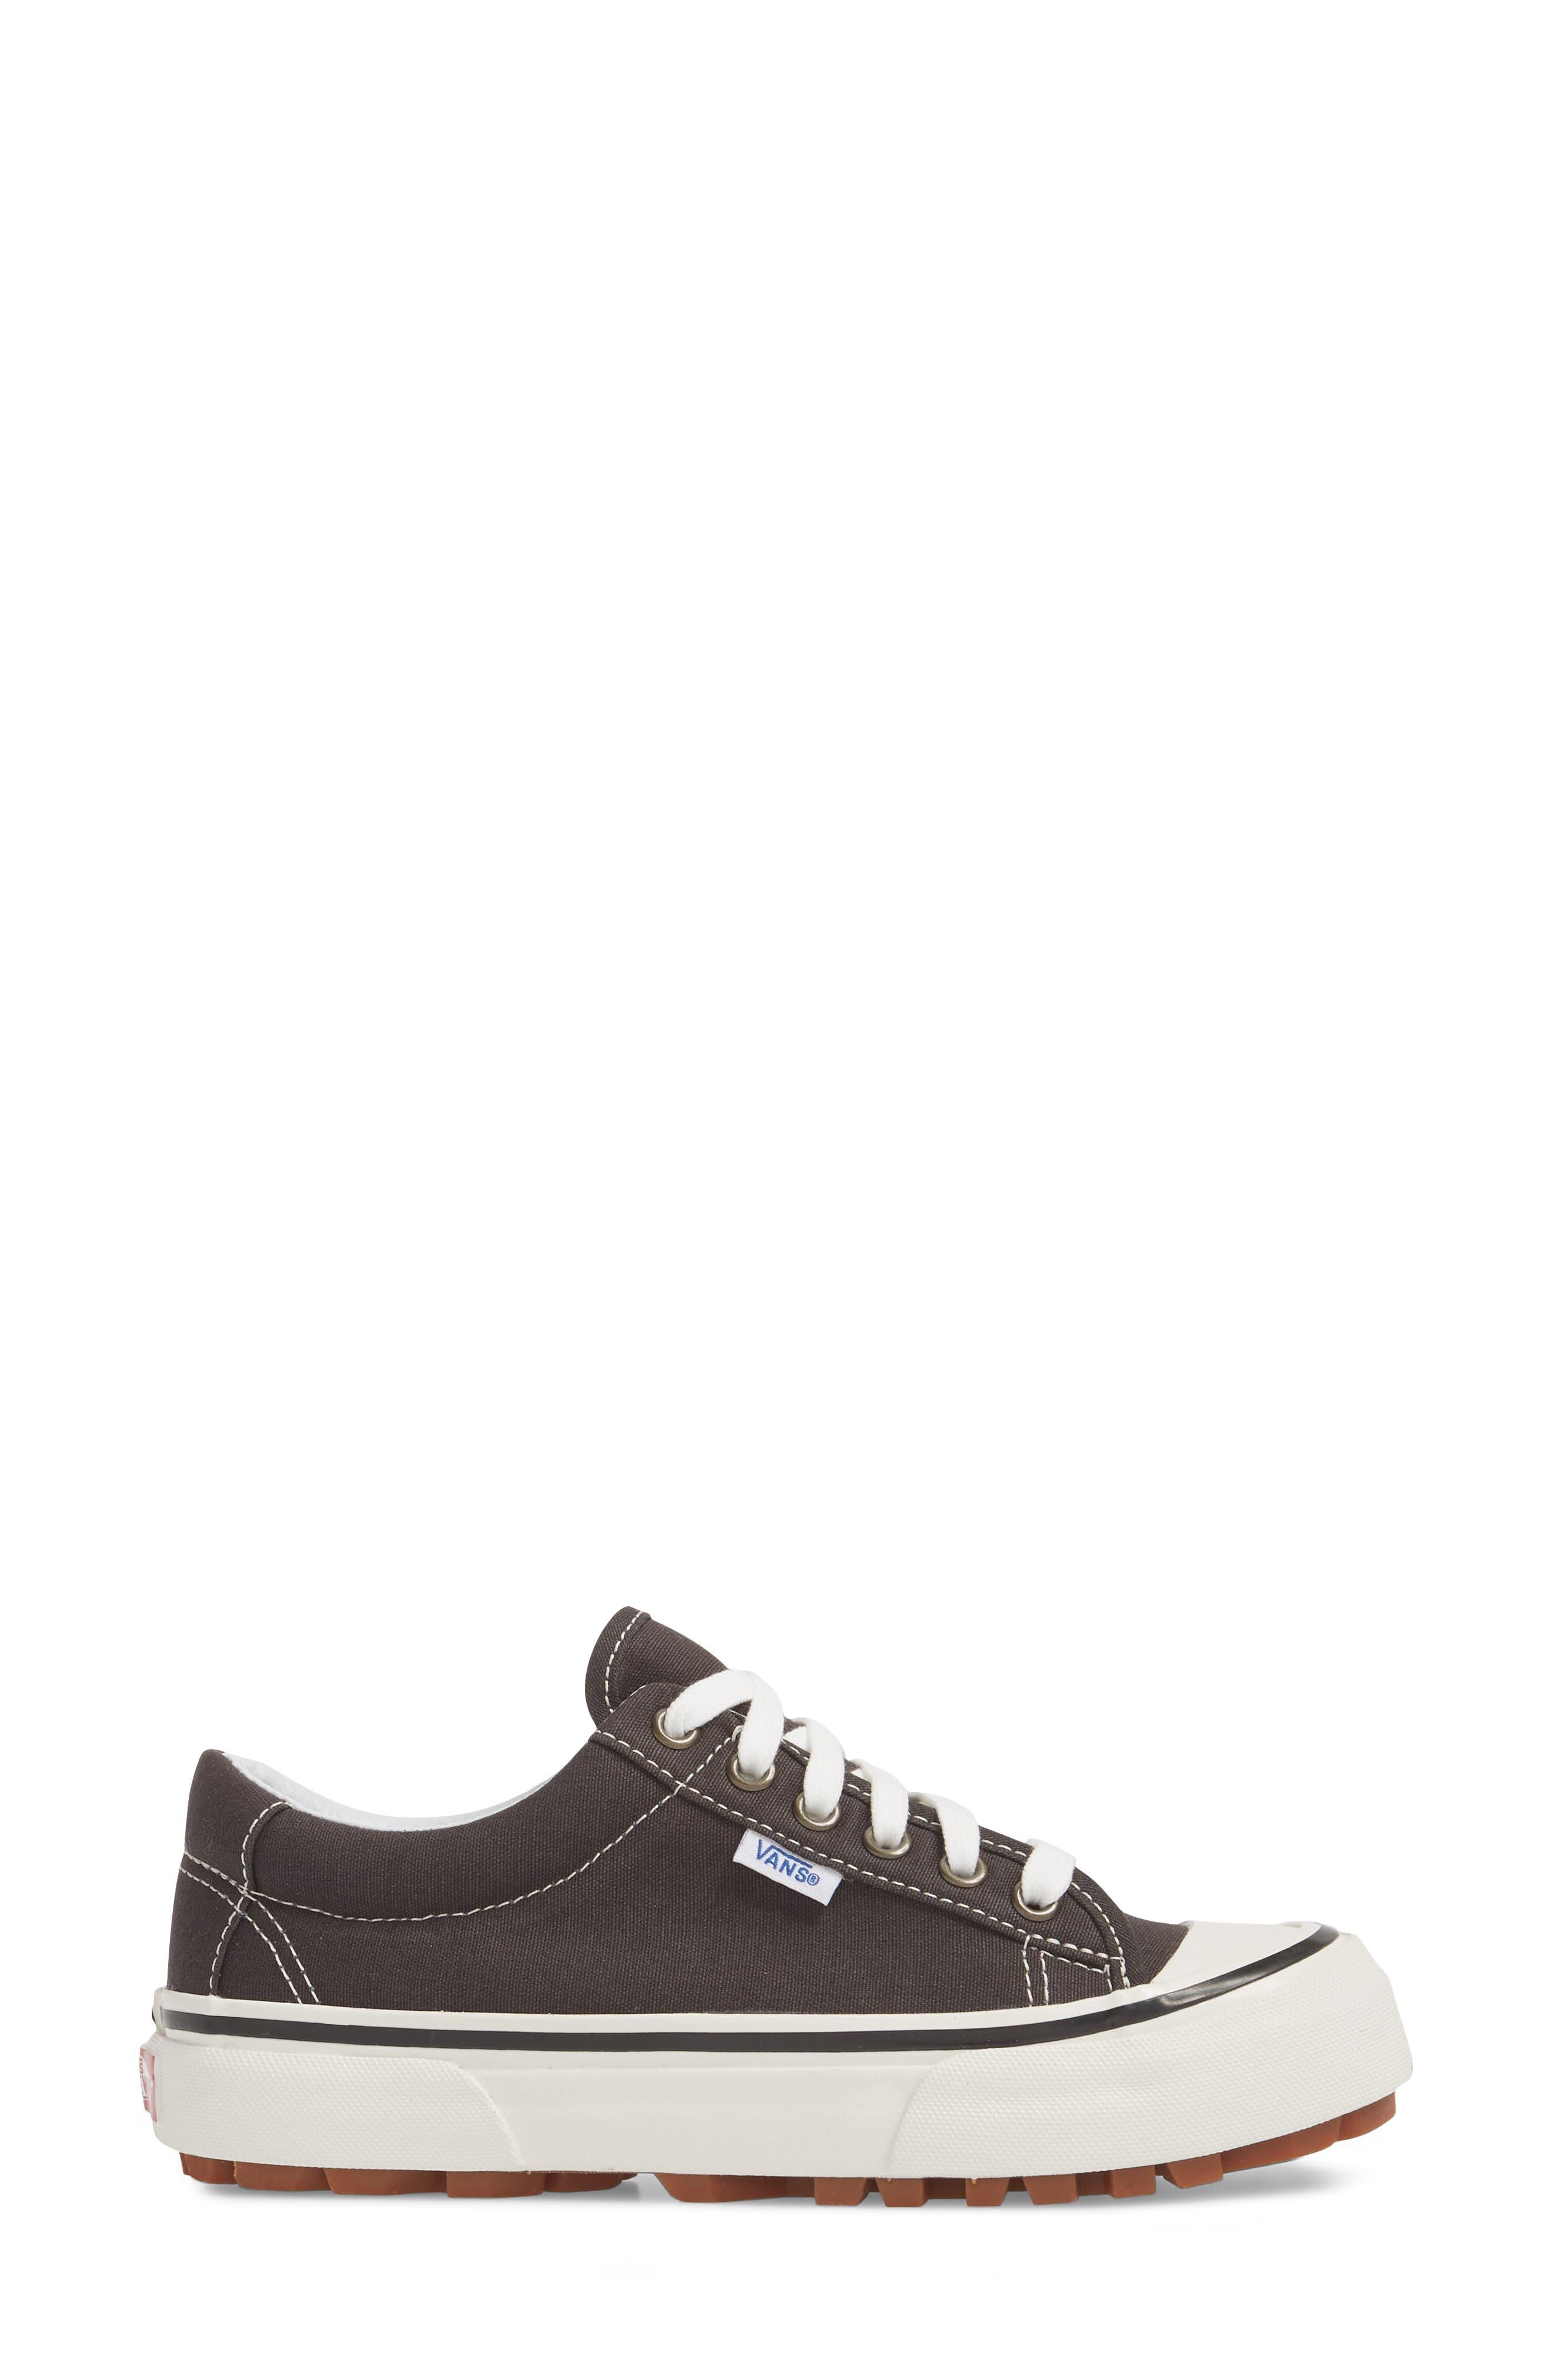 Anaheim Factory Style 29 DX Sneaker,                             Alternate thumbnail 3, color,                             001